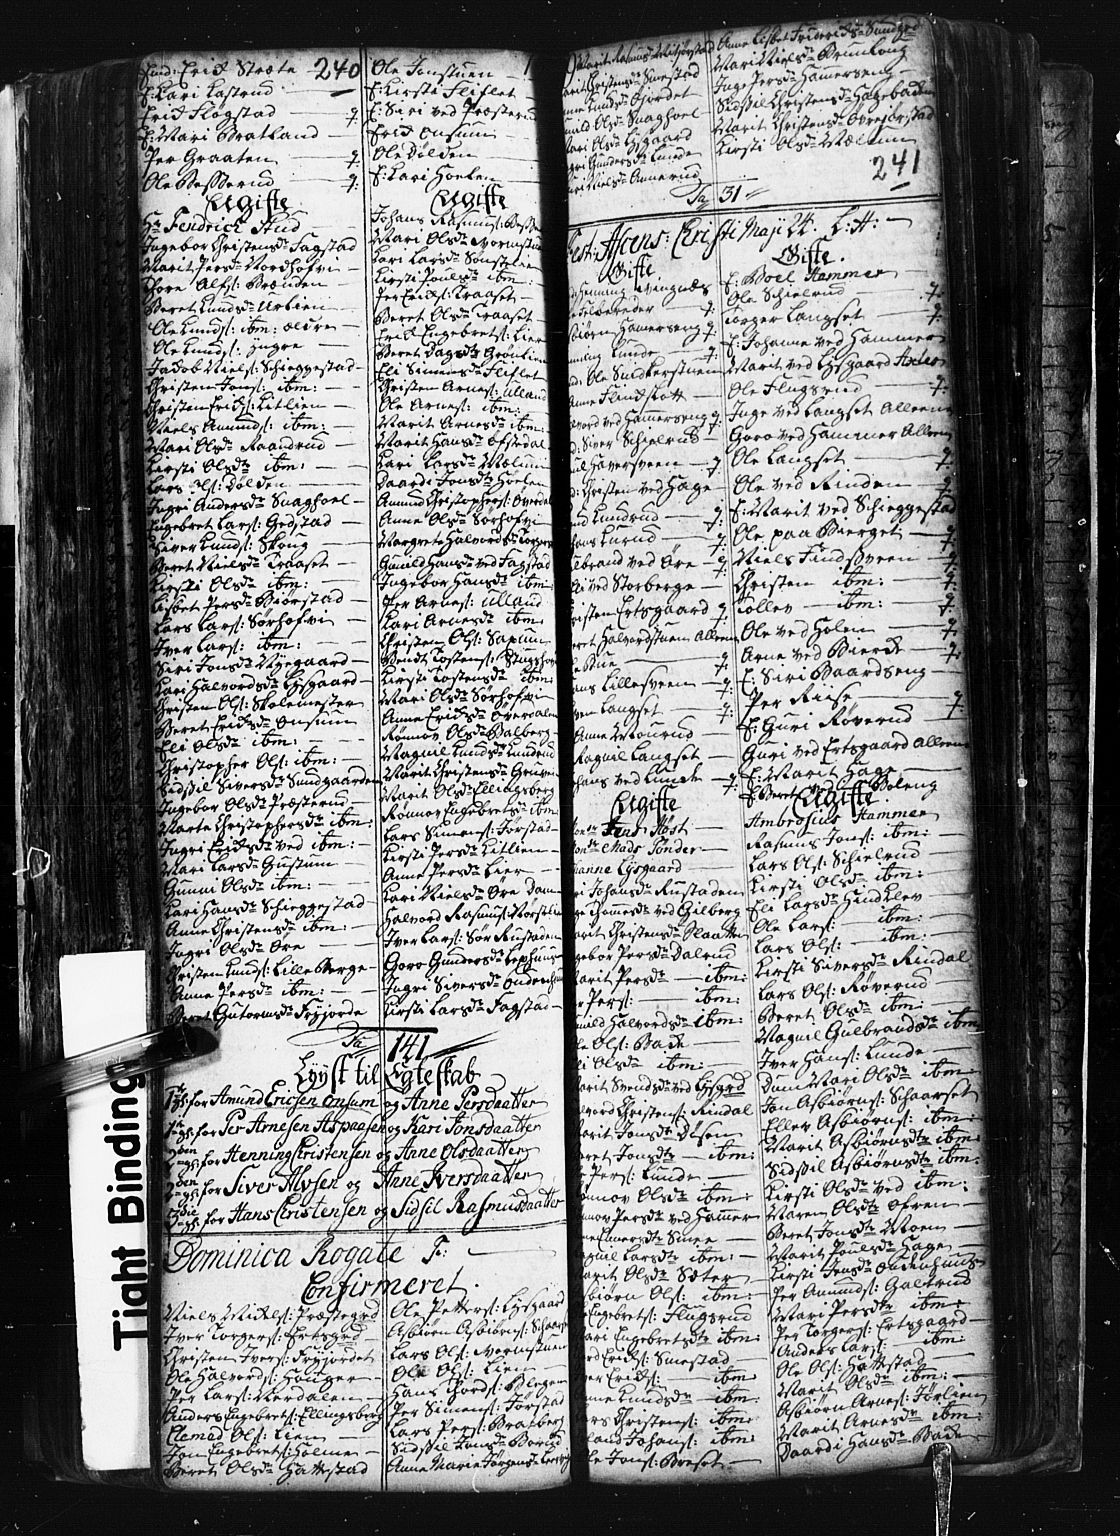 SAH, Fåberg prestekontor, Klokkerbok nr. 1, 1727-1767, s. 240-241